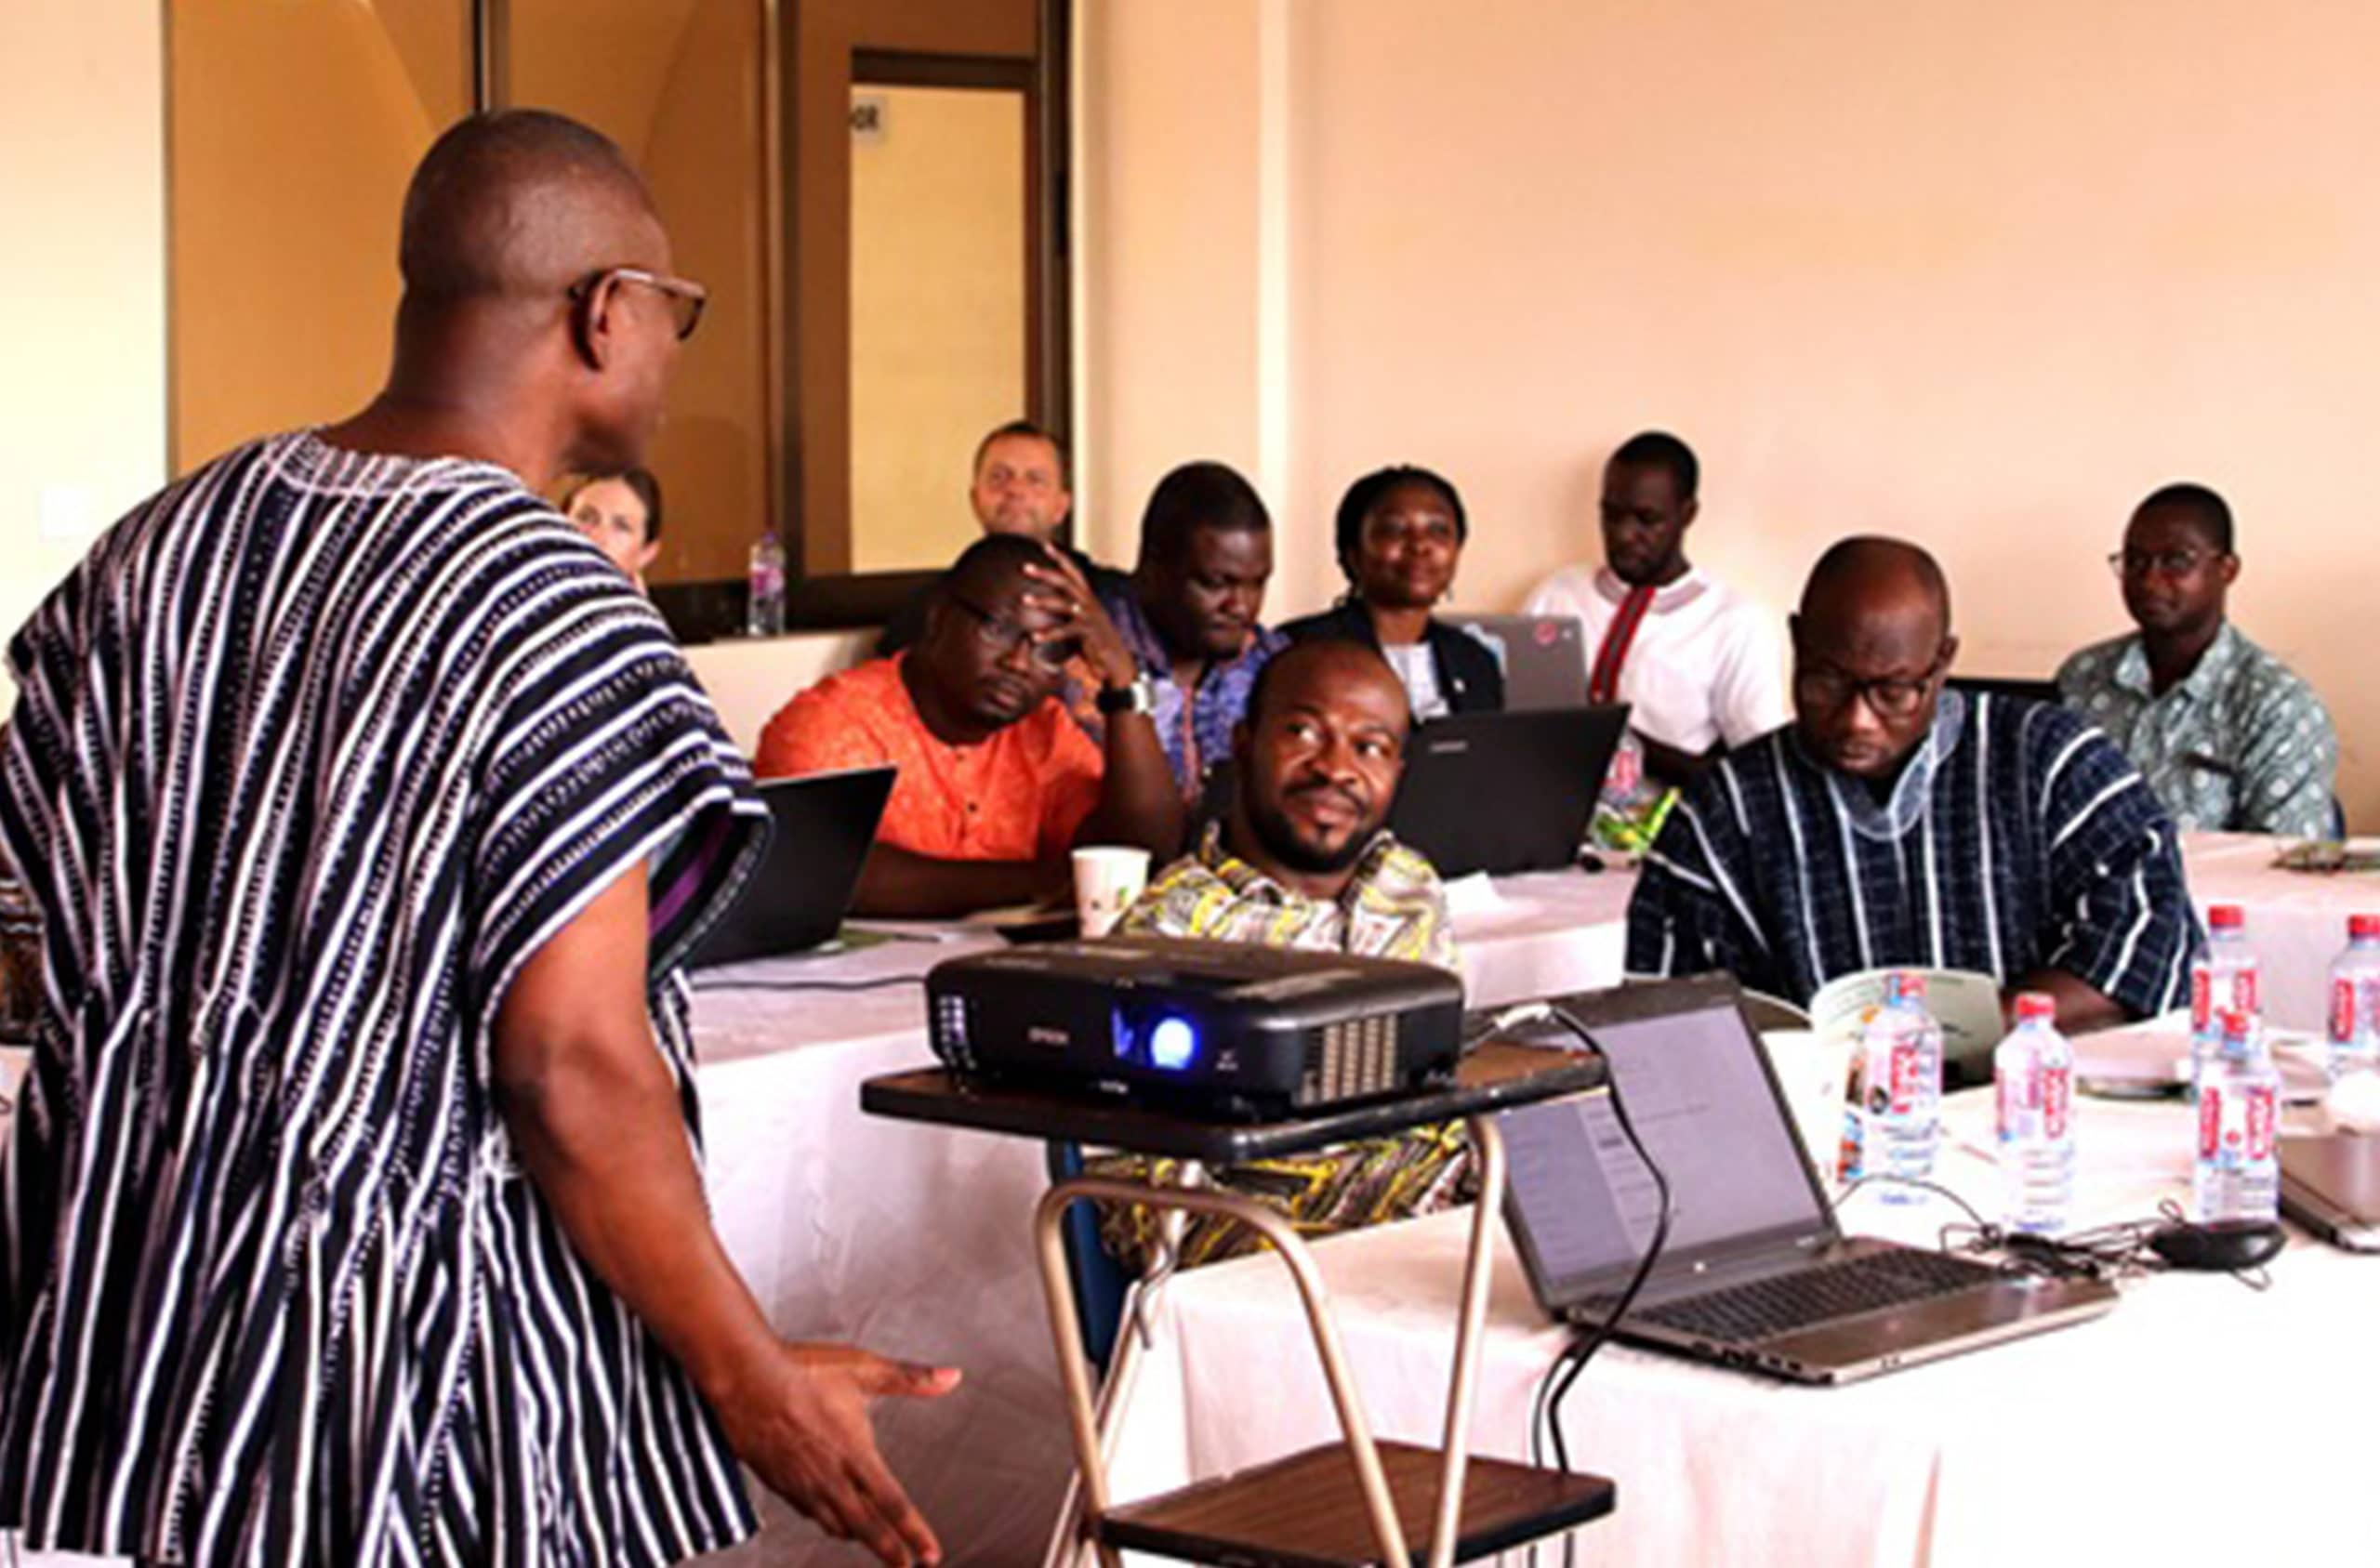 Journalist Emmanuel K. Dogbevi gave a presentation to the researchers.